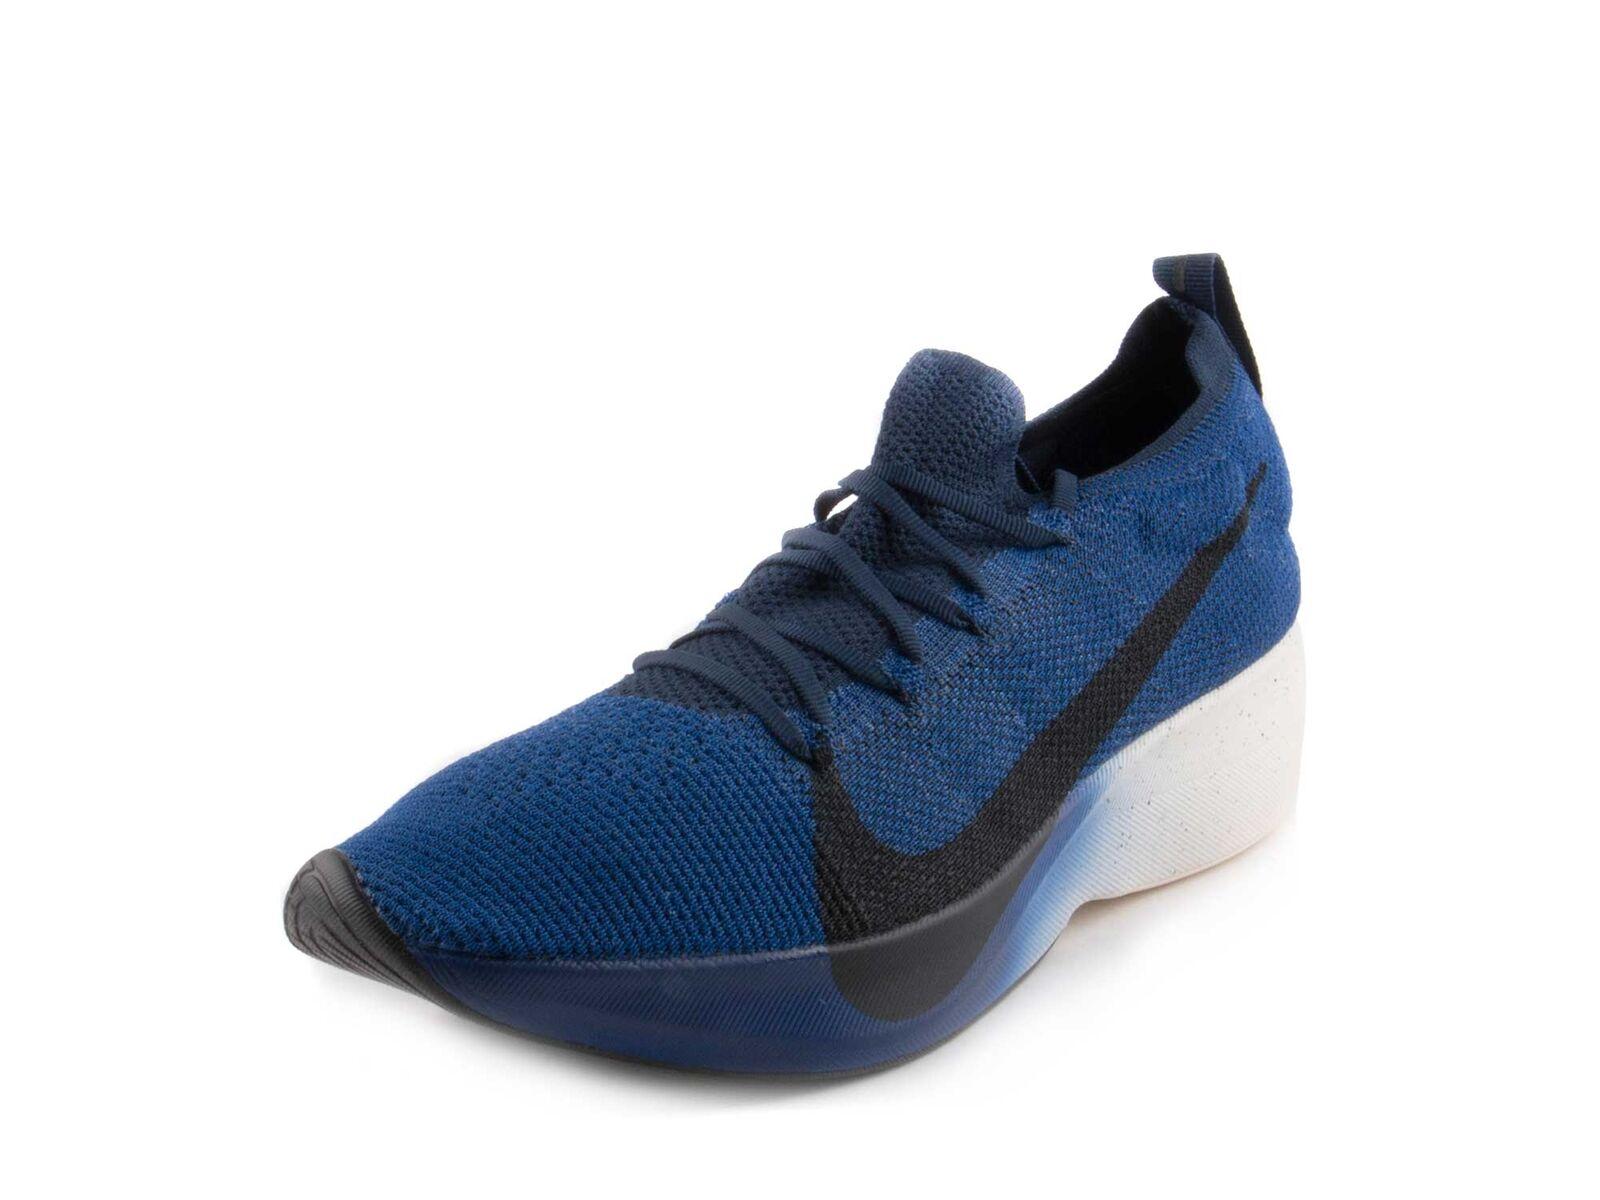 568364b96eb2 Nike Vapor Street Flyknit Men s Running Shoes Size 11 Aq1763 400 for ...